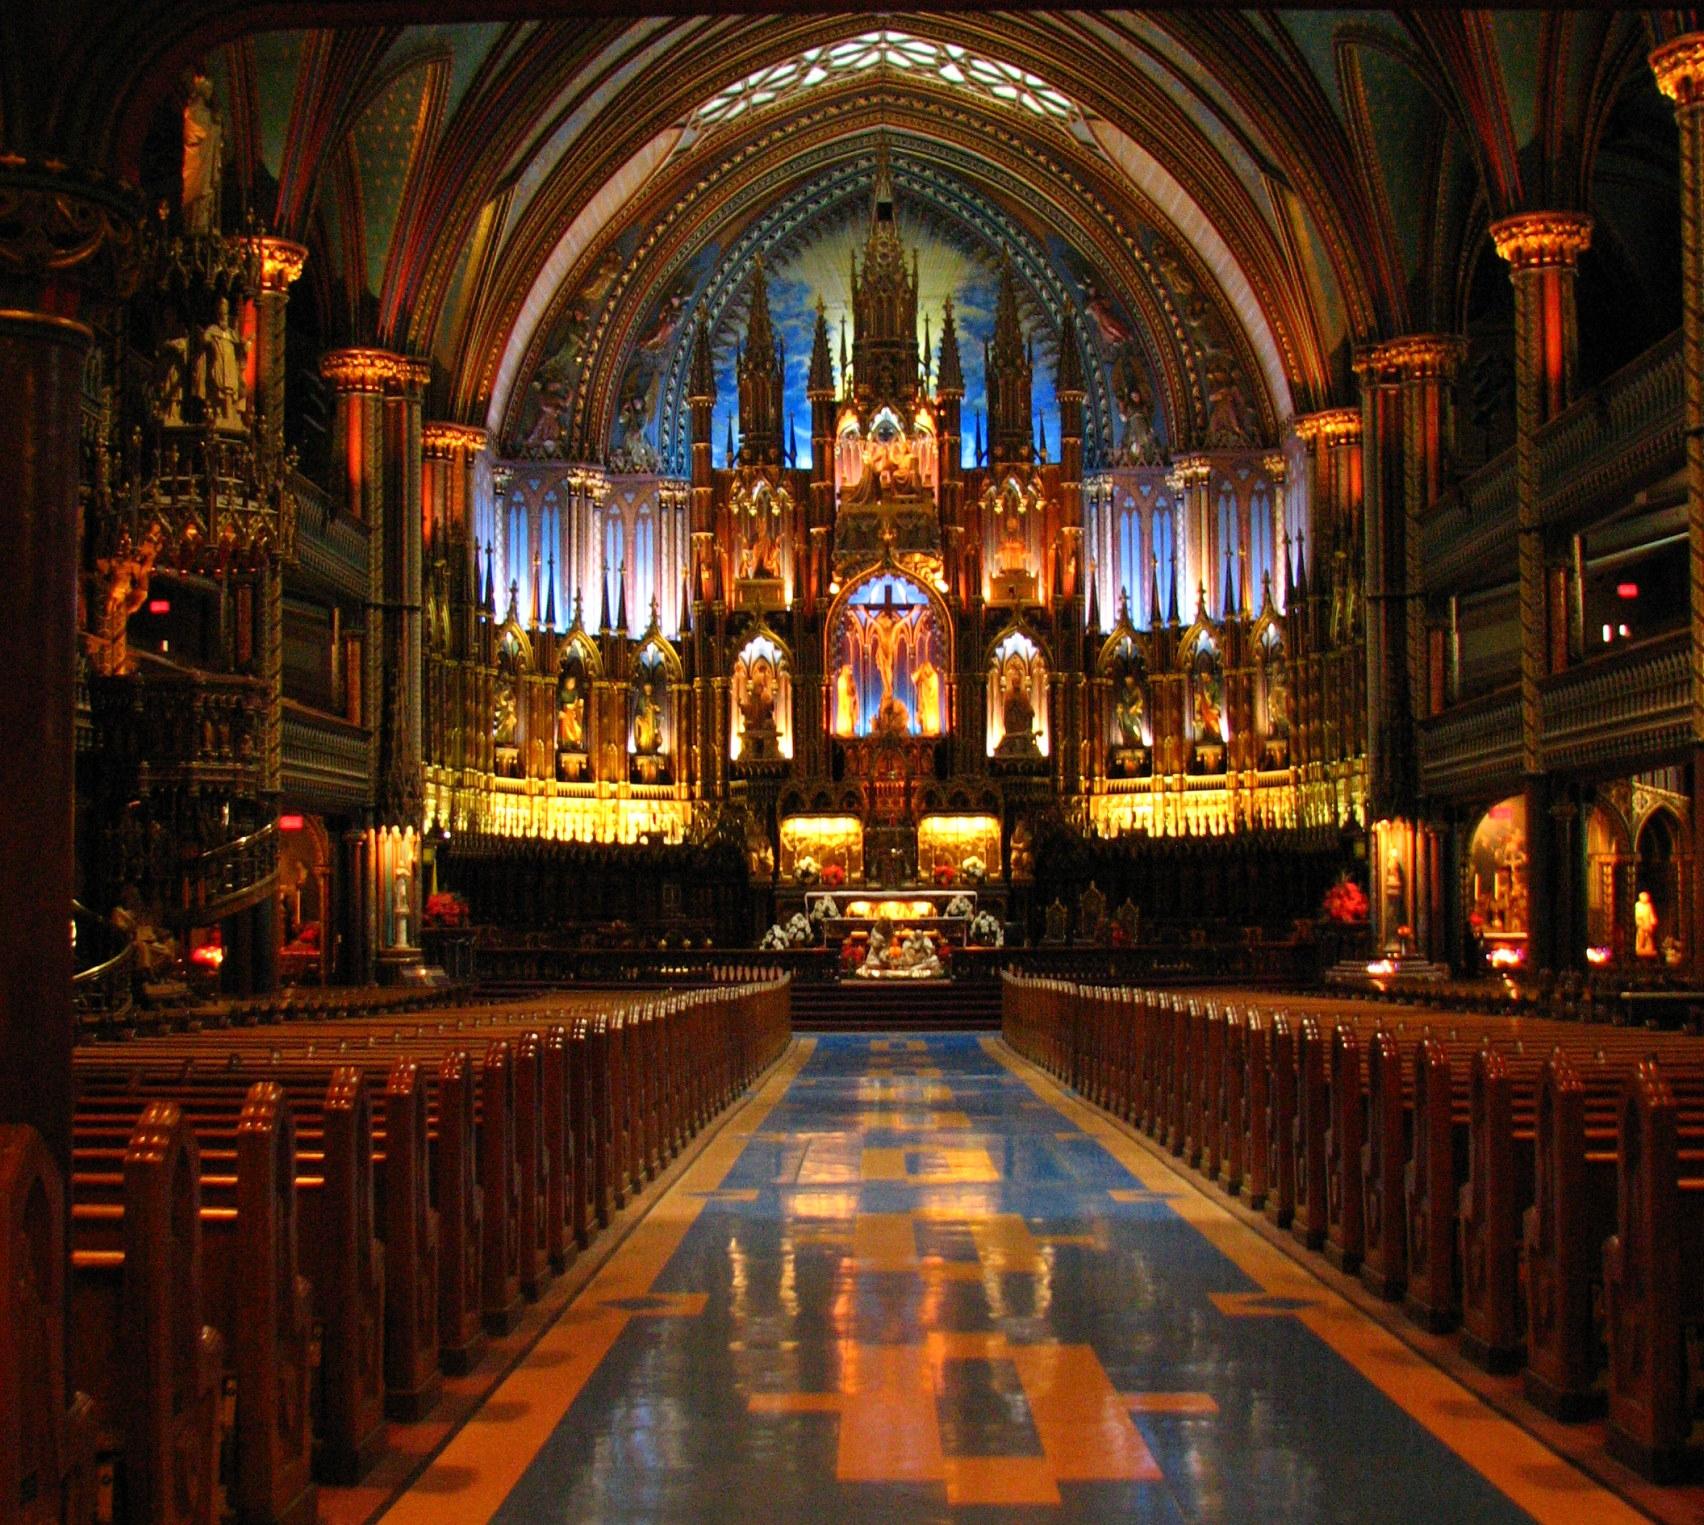 парочка католический собор фото внутри дрозд ведет